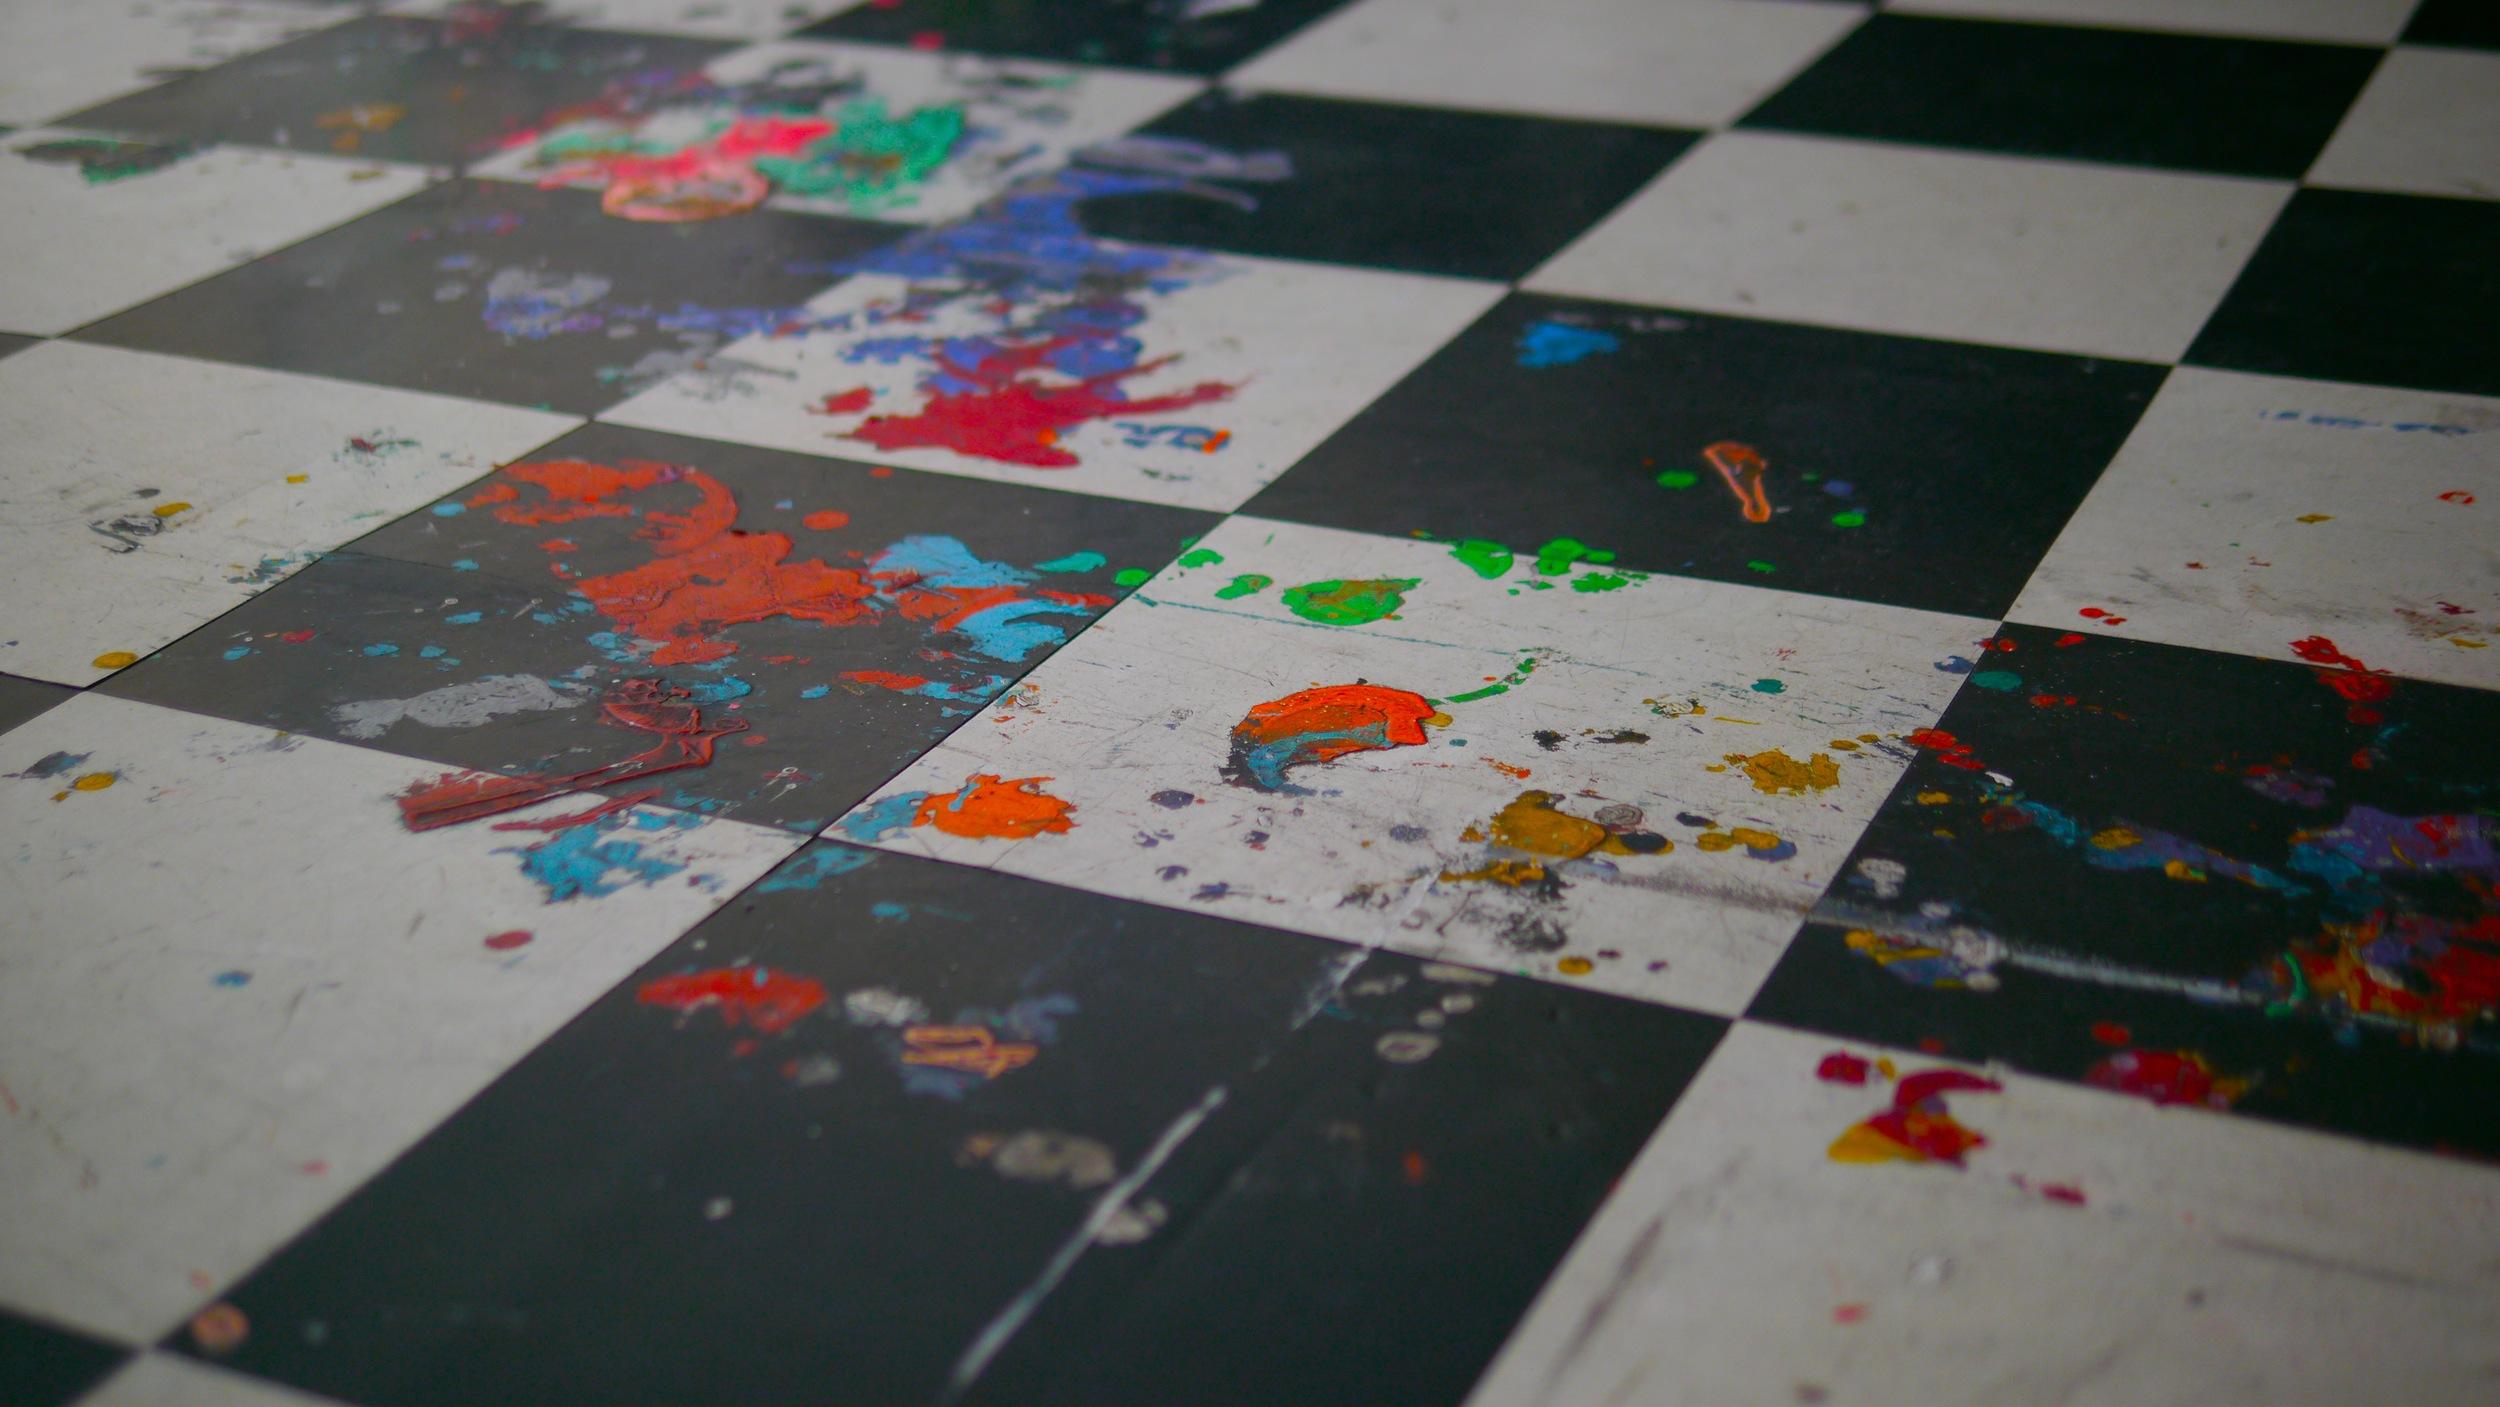 Maria-Brito_Keith-Haring-Foundation-10.jpg